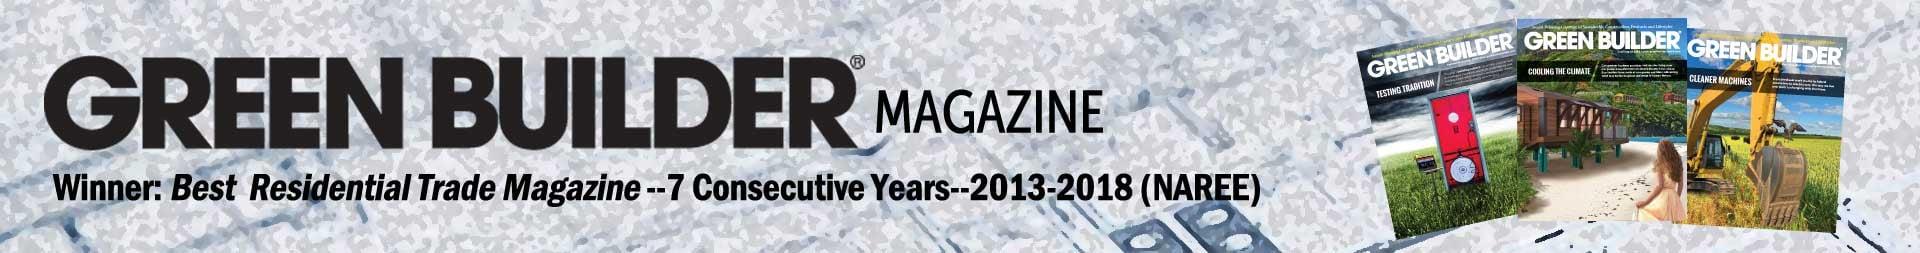 GB-Magazine-Banner-2019